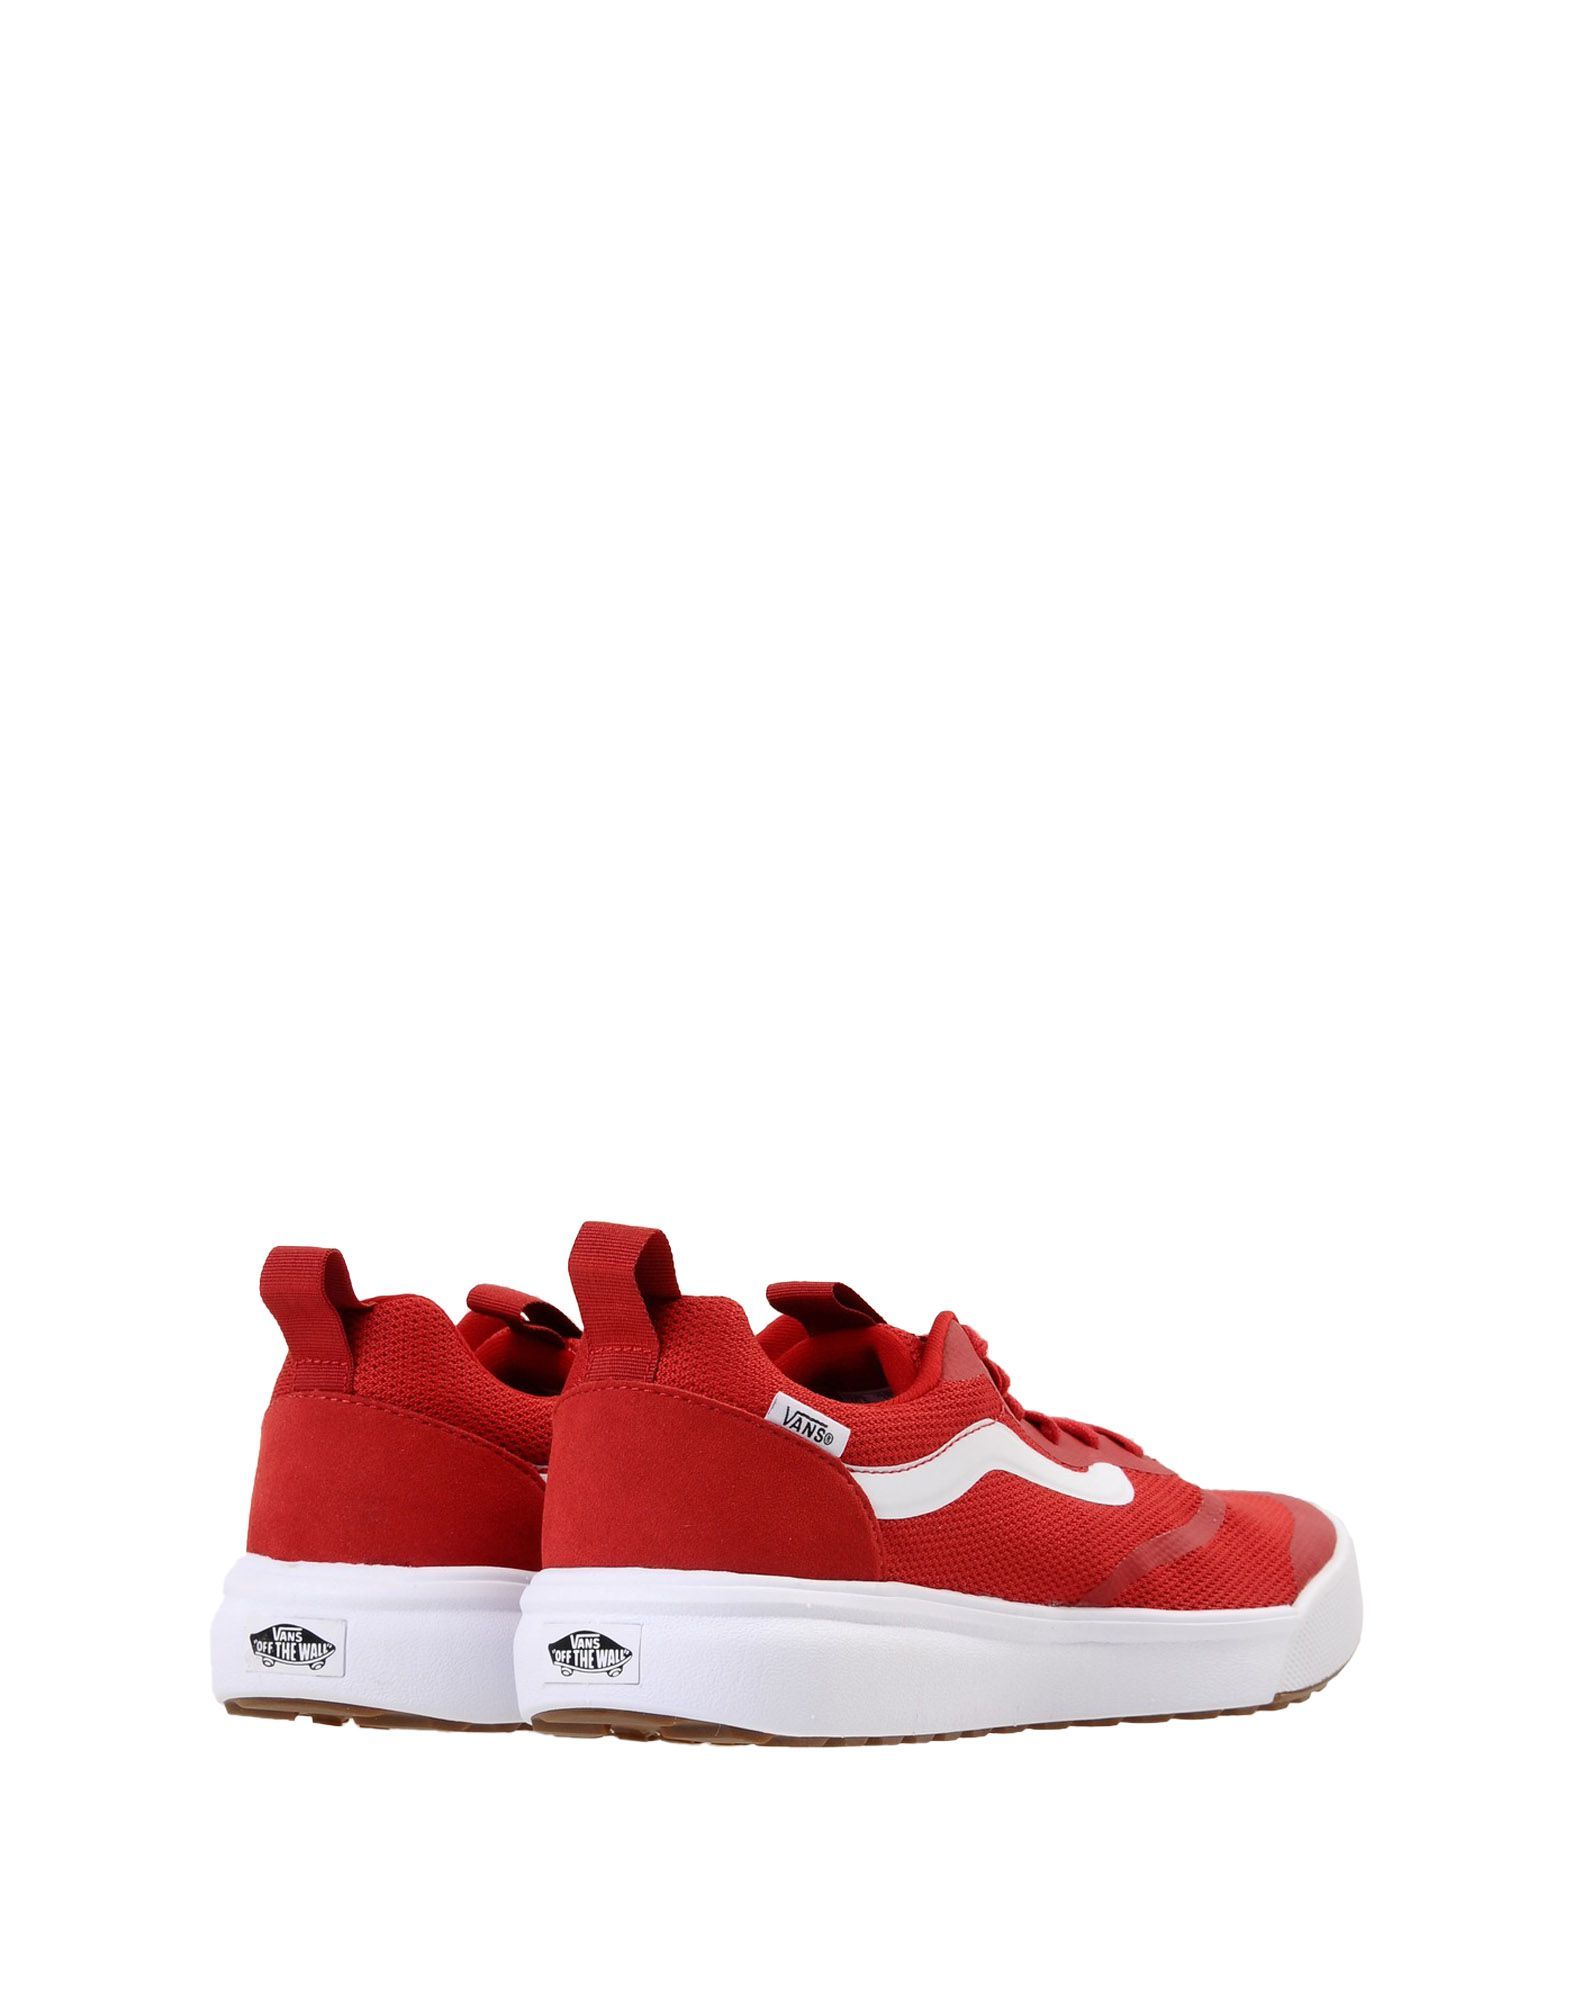 Sneakers Vans Ua Ultrarange Rapidweld - Femme - Sneakers Vans sur